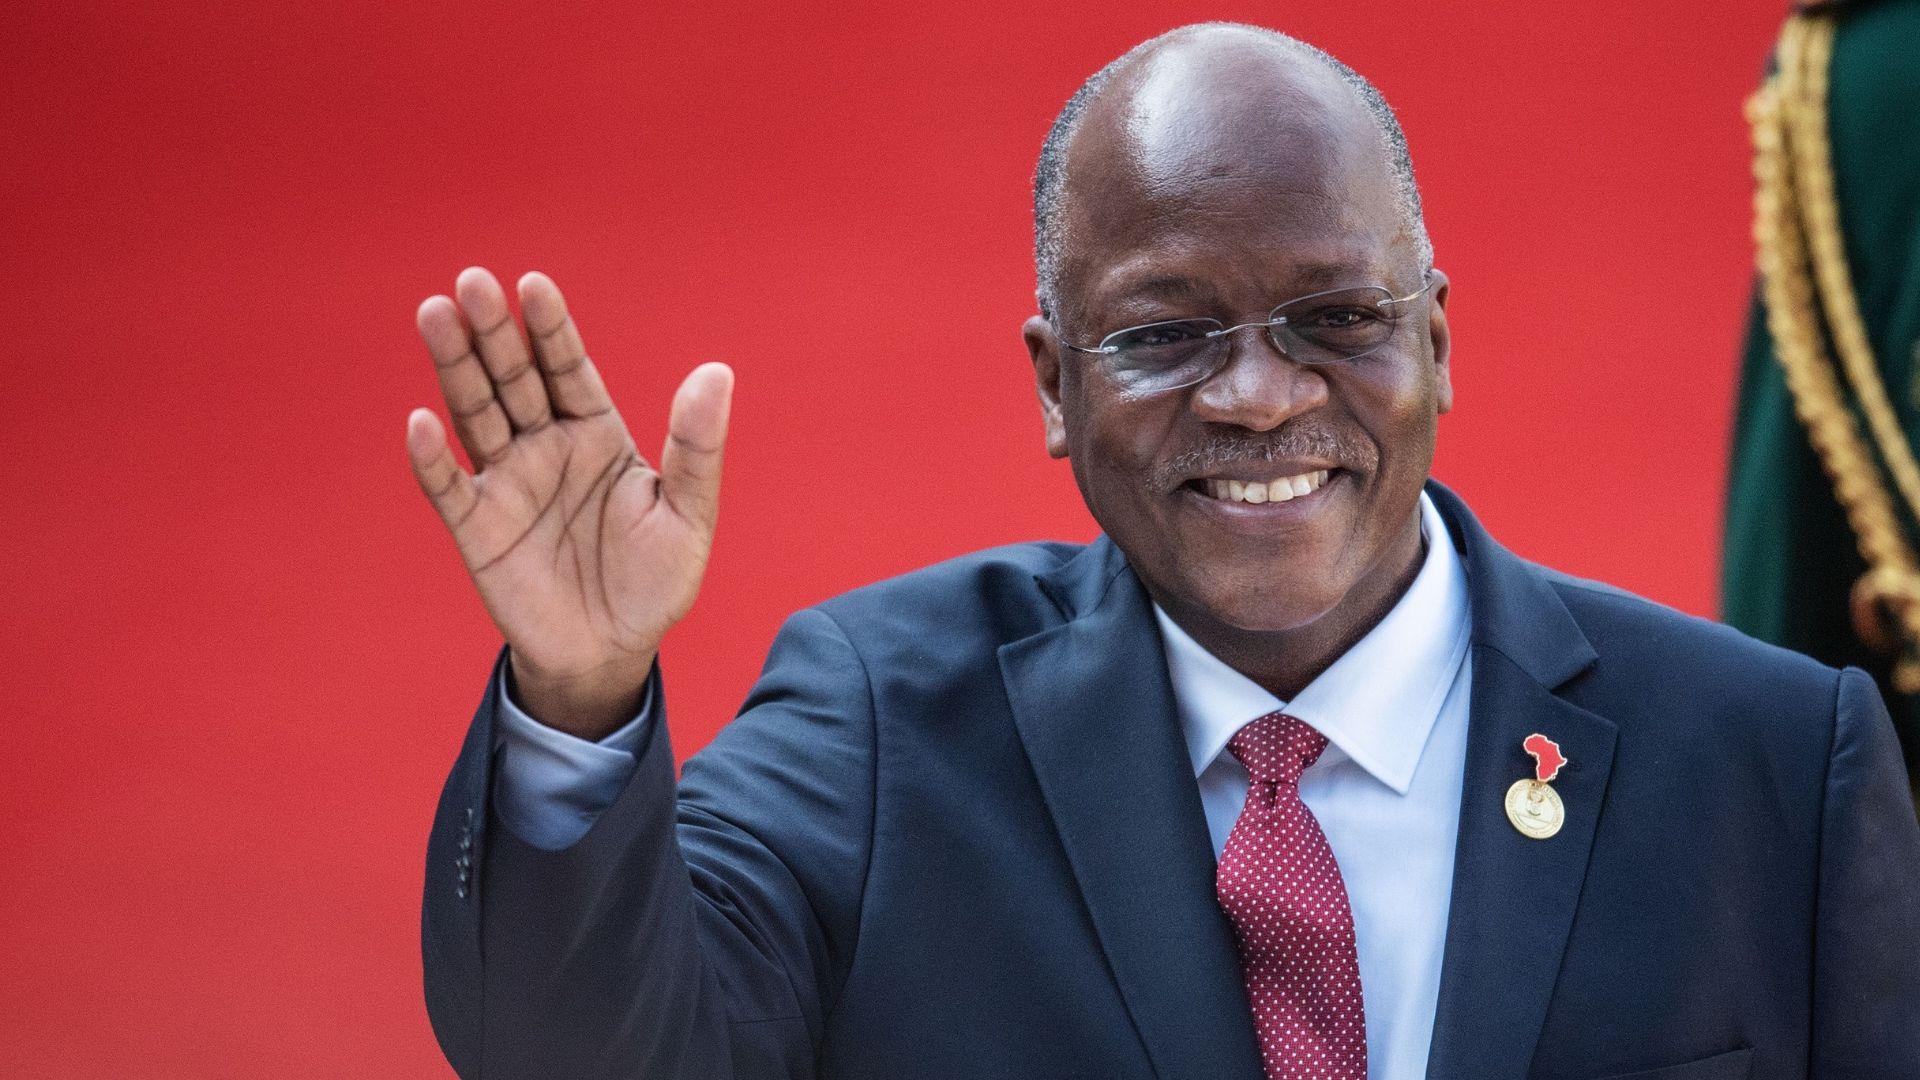 Breaking News - President John Magufuli of Tanzania Dies at 61